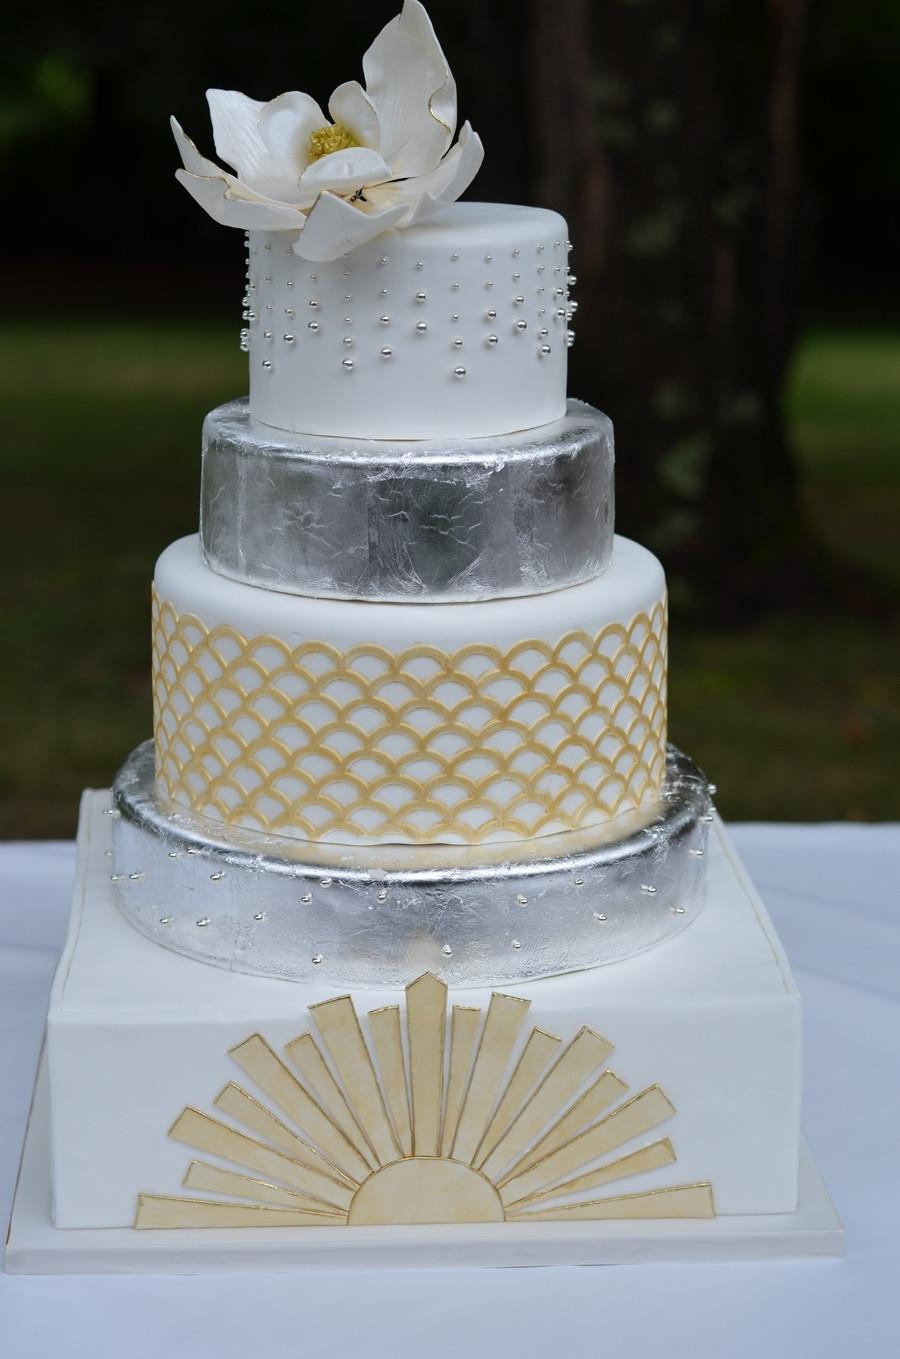 Gatsby Wedding Cakes  Great Gatsby Wedding Cake With Sugar Magnolia And Edible